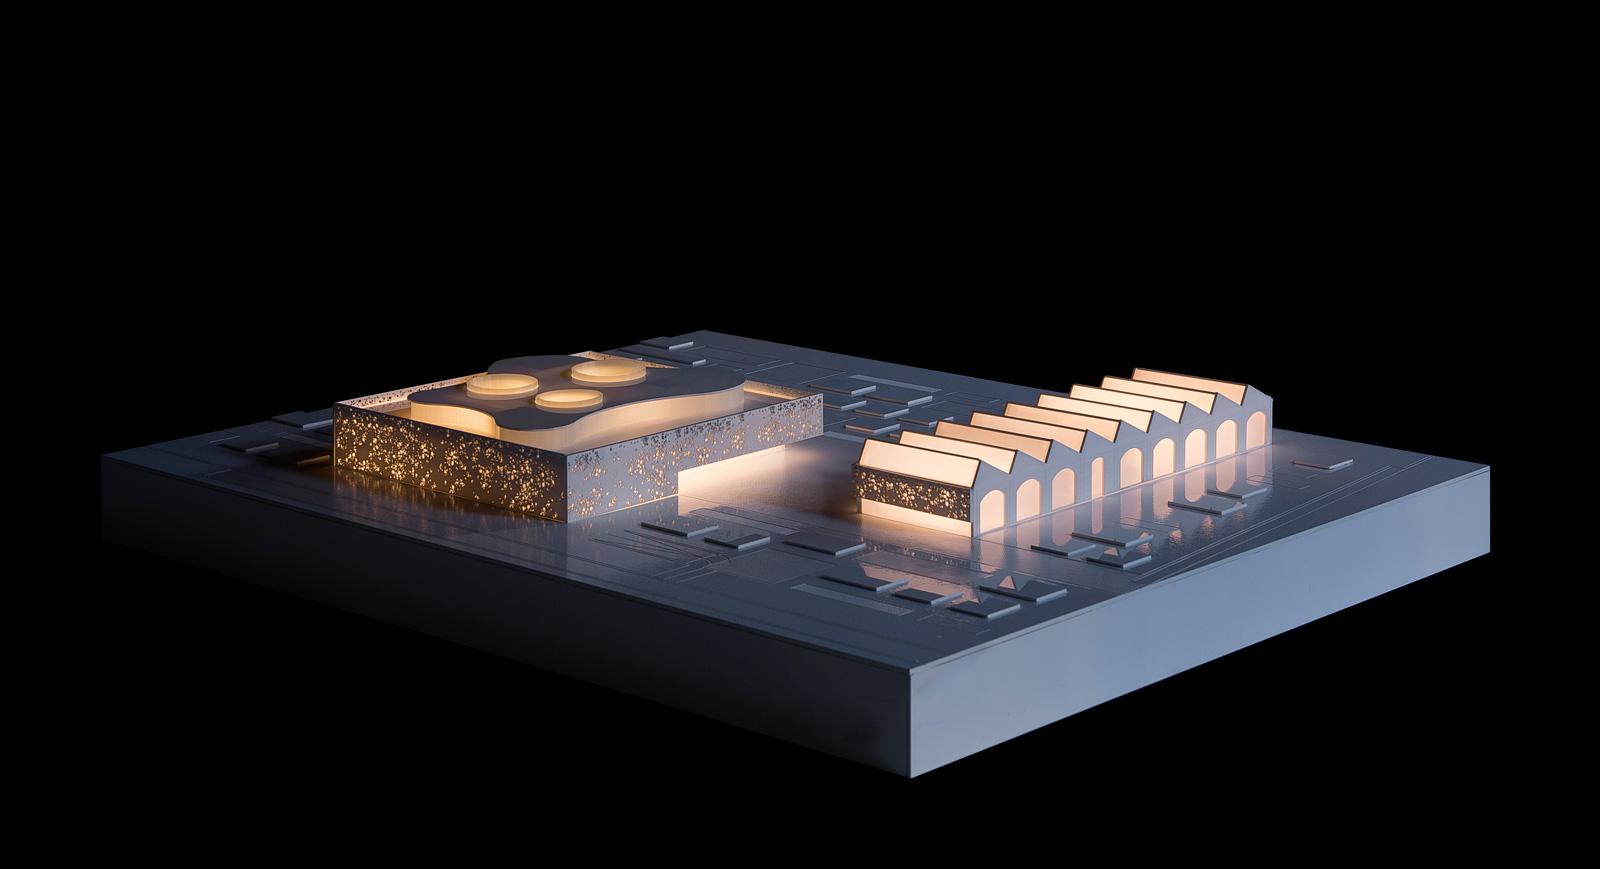 maqueta-arquitectura-concurso-valencia-iluminada-pfc-centro-musical-1